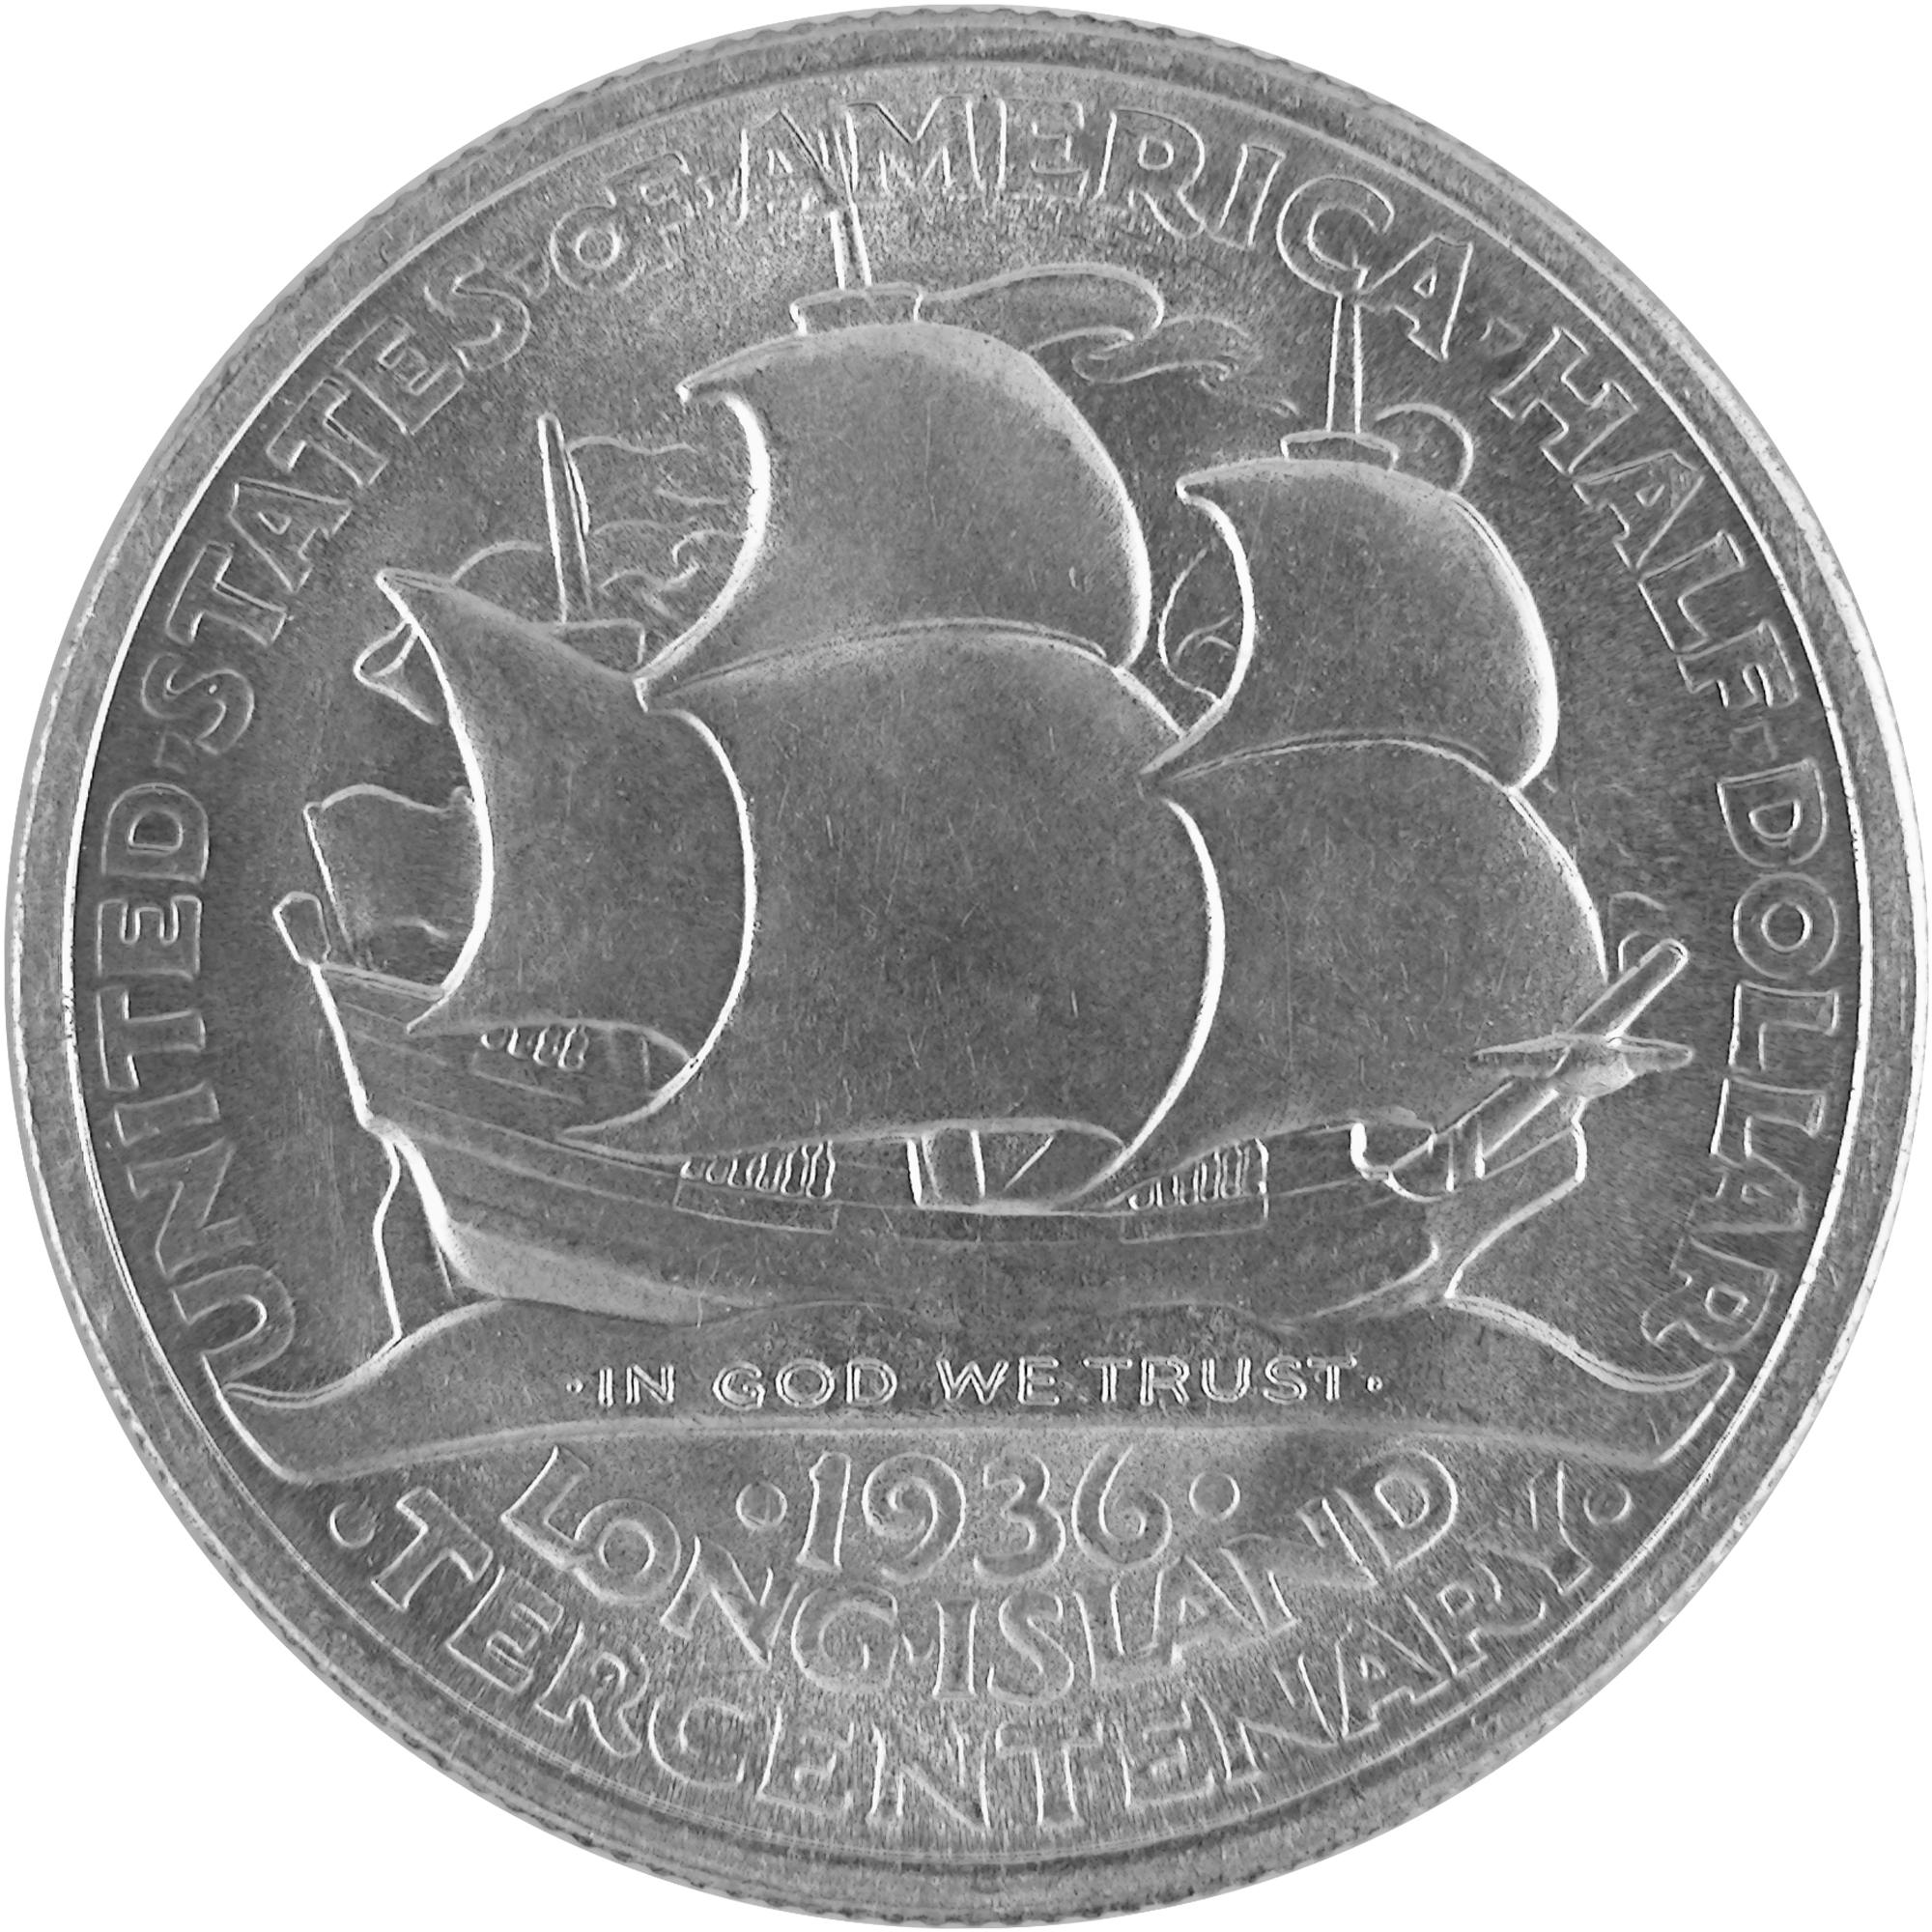 1936 Long Island Tercentenary Commemorative Silver Half Dollar Coin Reverse